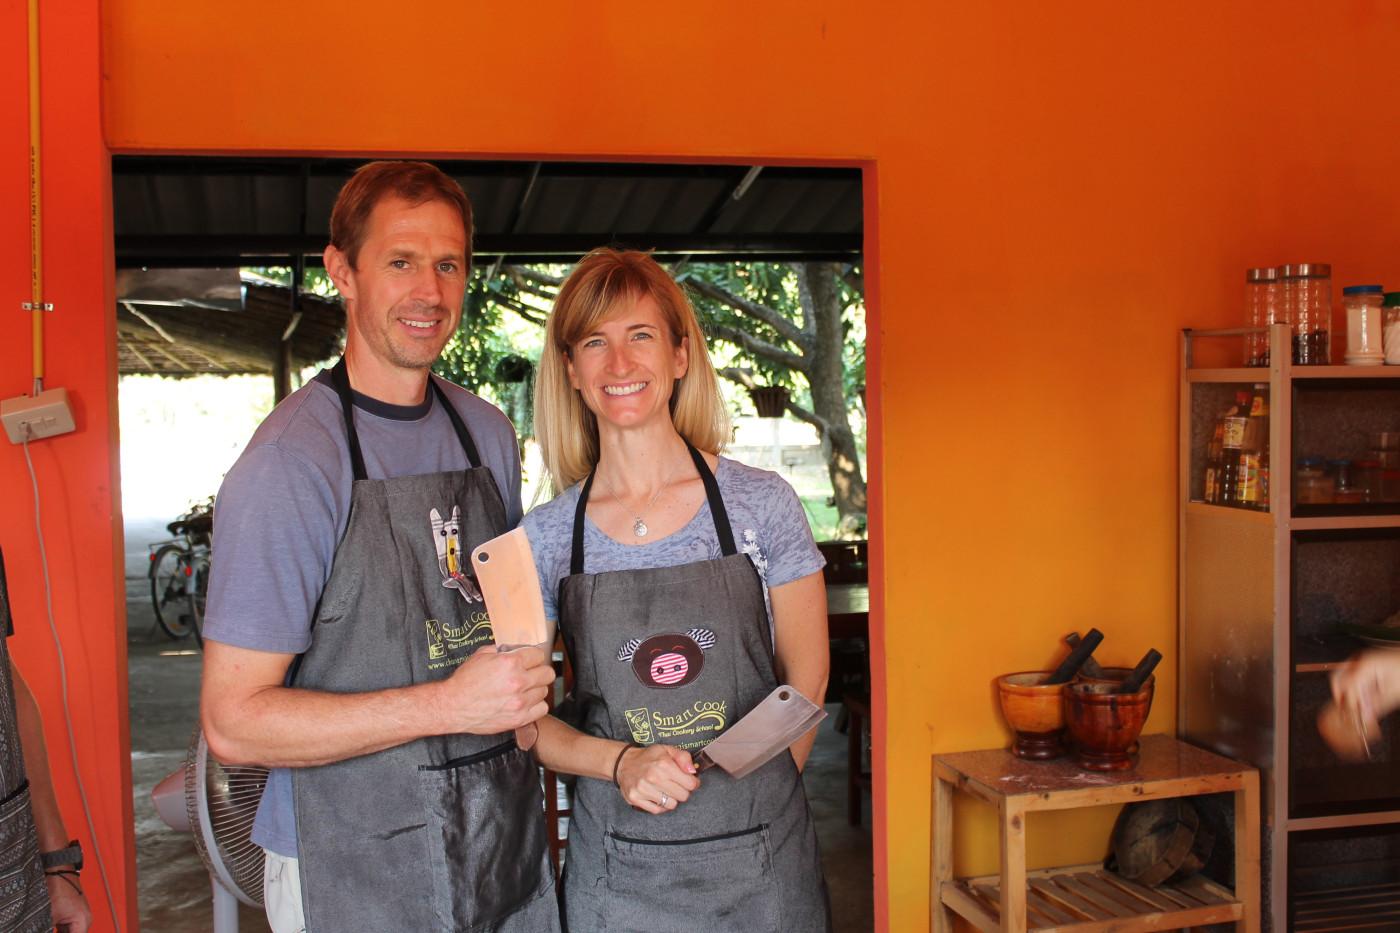 Ryan & Rebecca learning to cook Thai food - November 2012